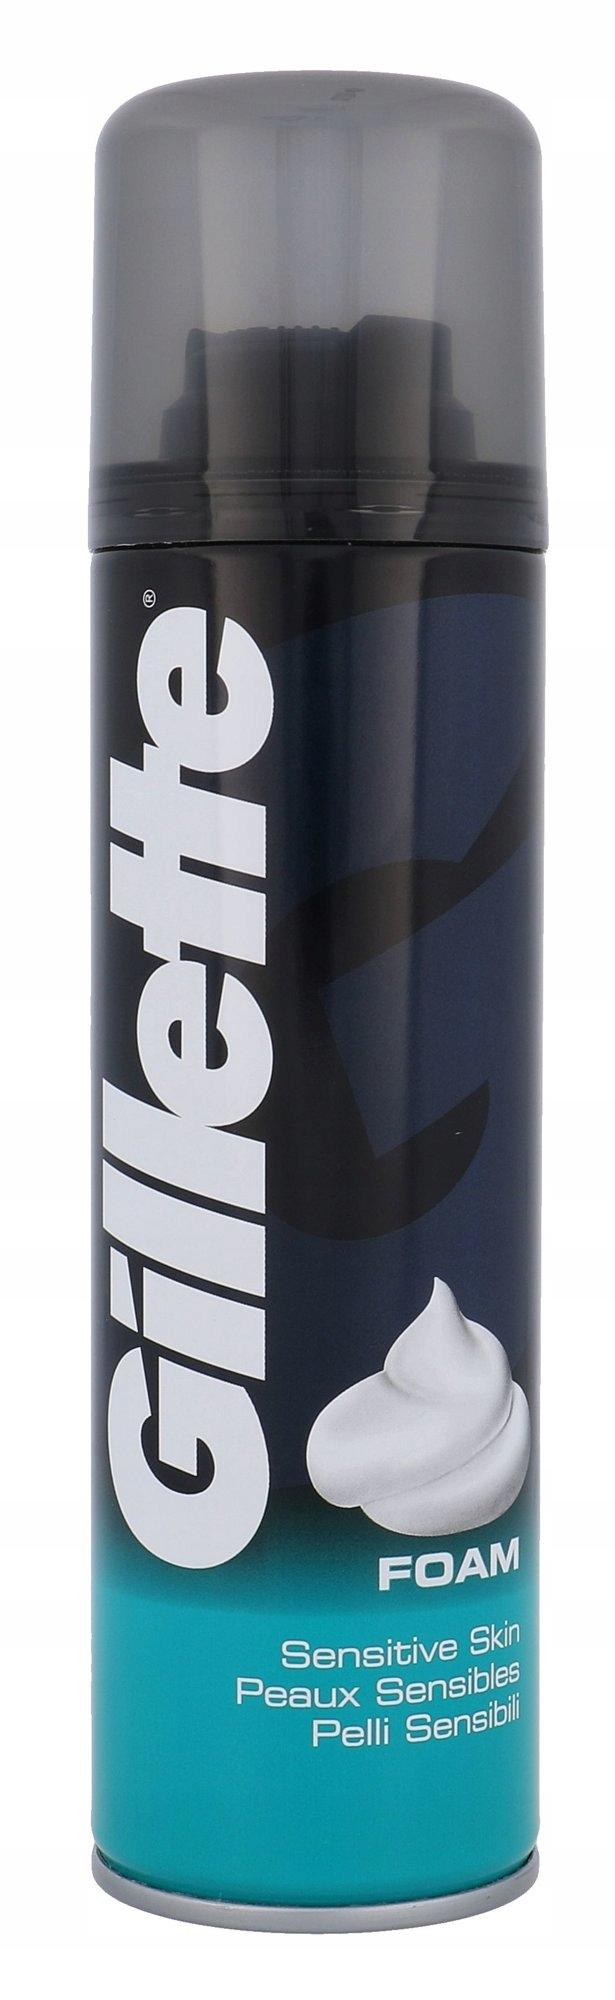 Gillette Shave Foam Sensitive 200 ml